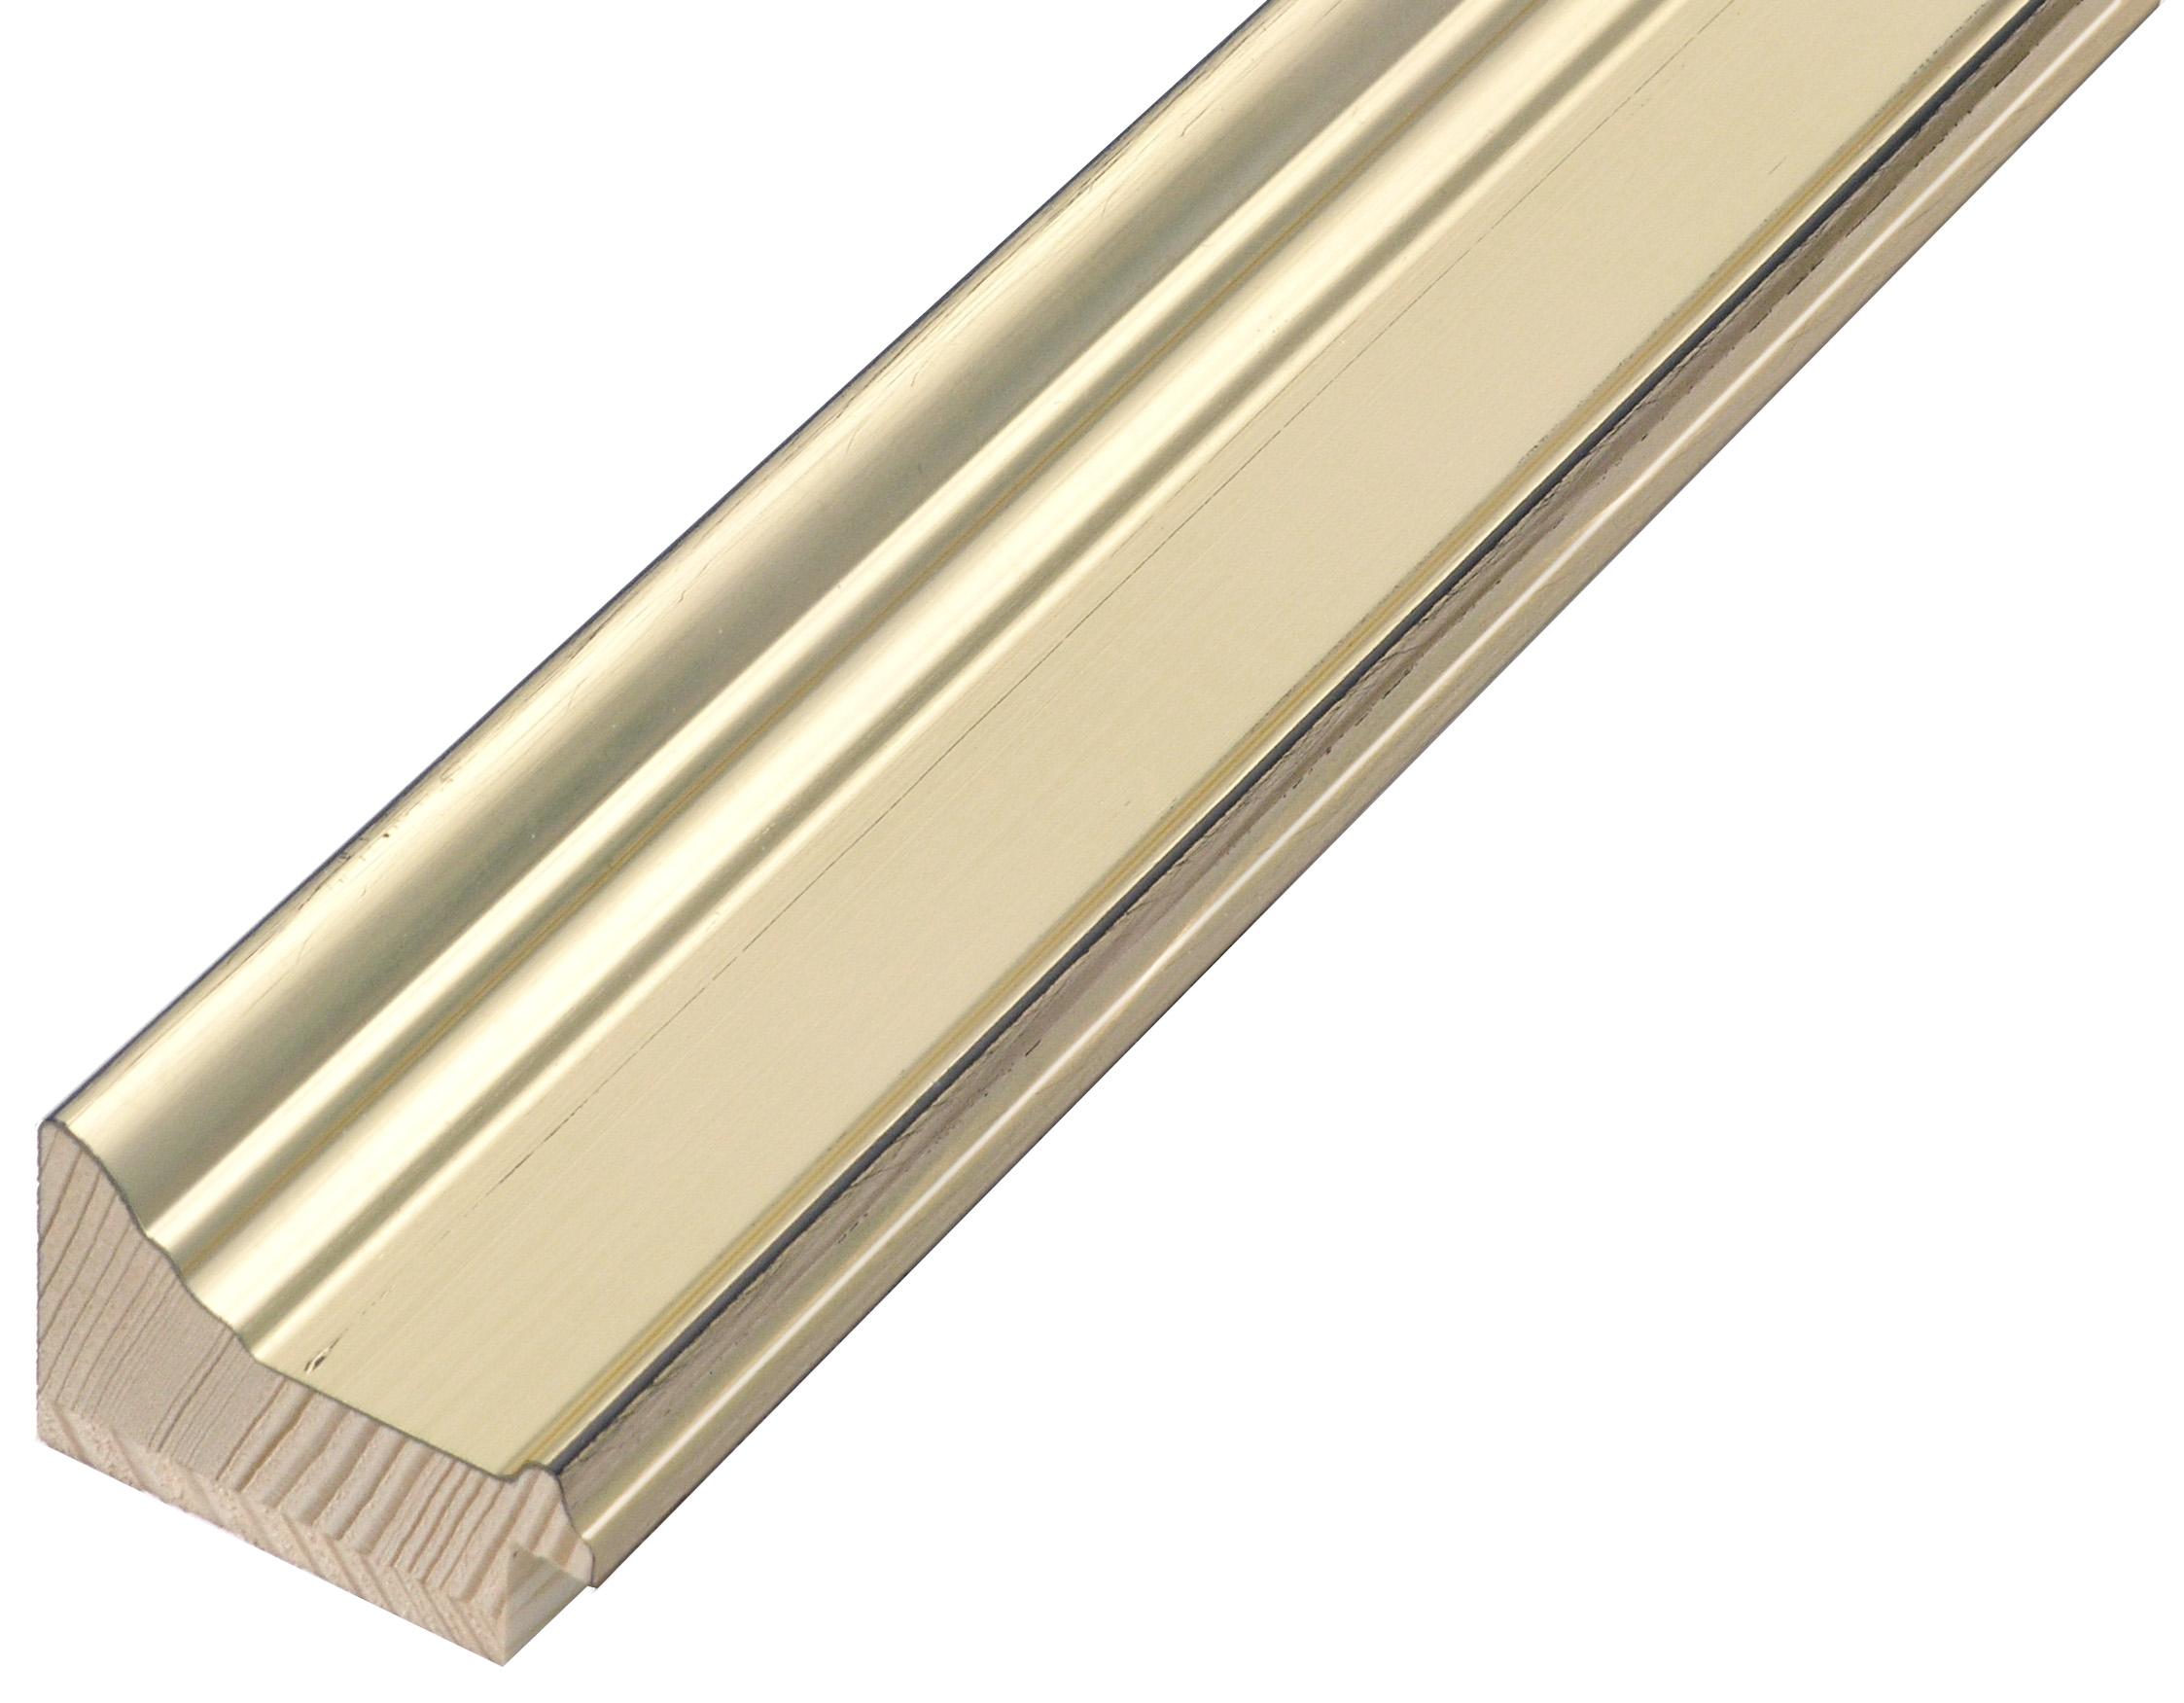 Moulding finger joint pine - width 42mm height 29 - platinum